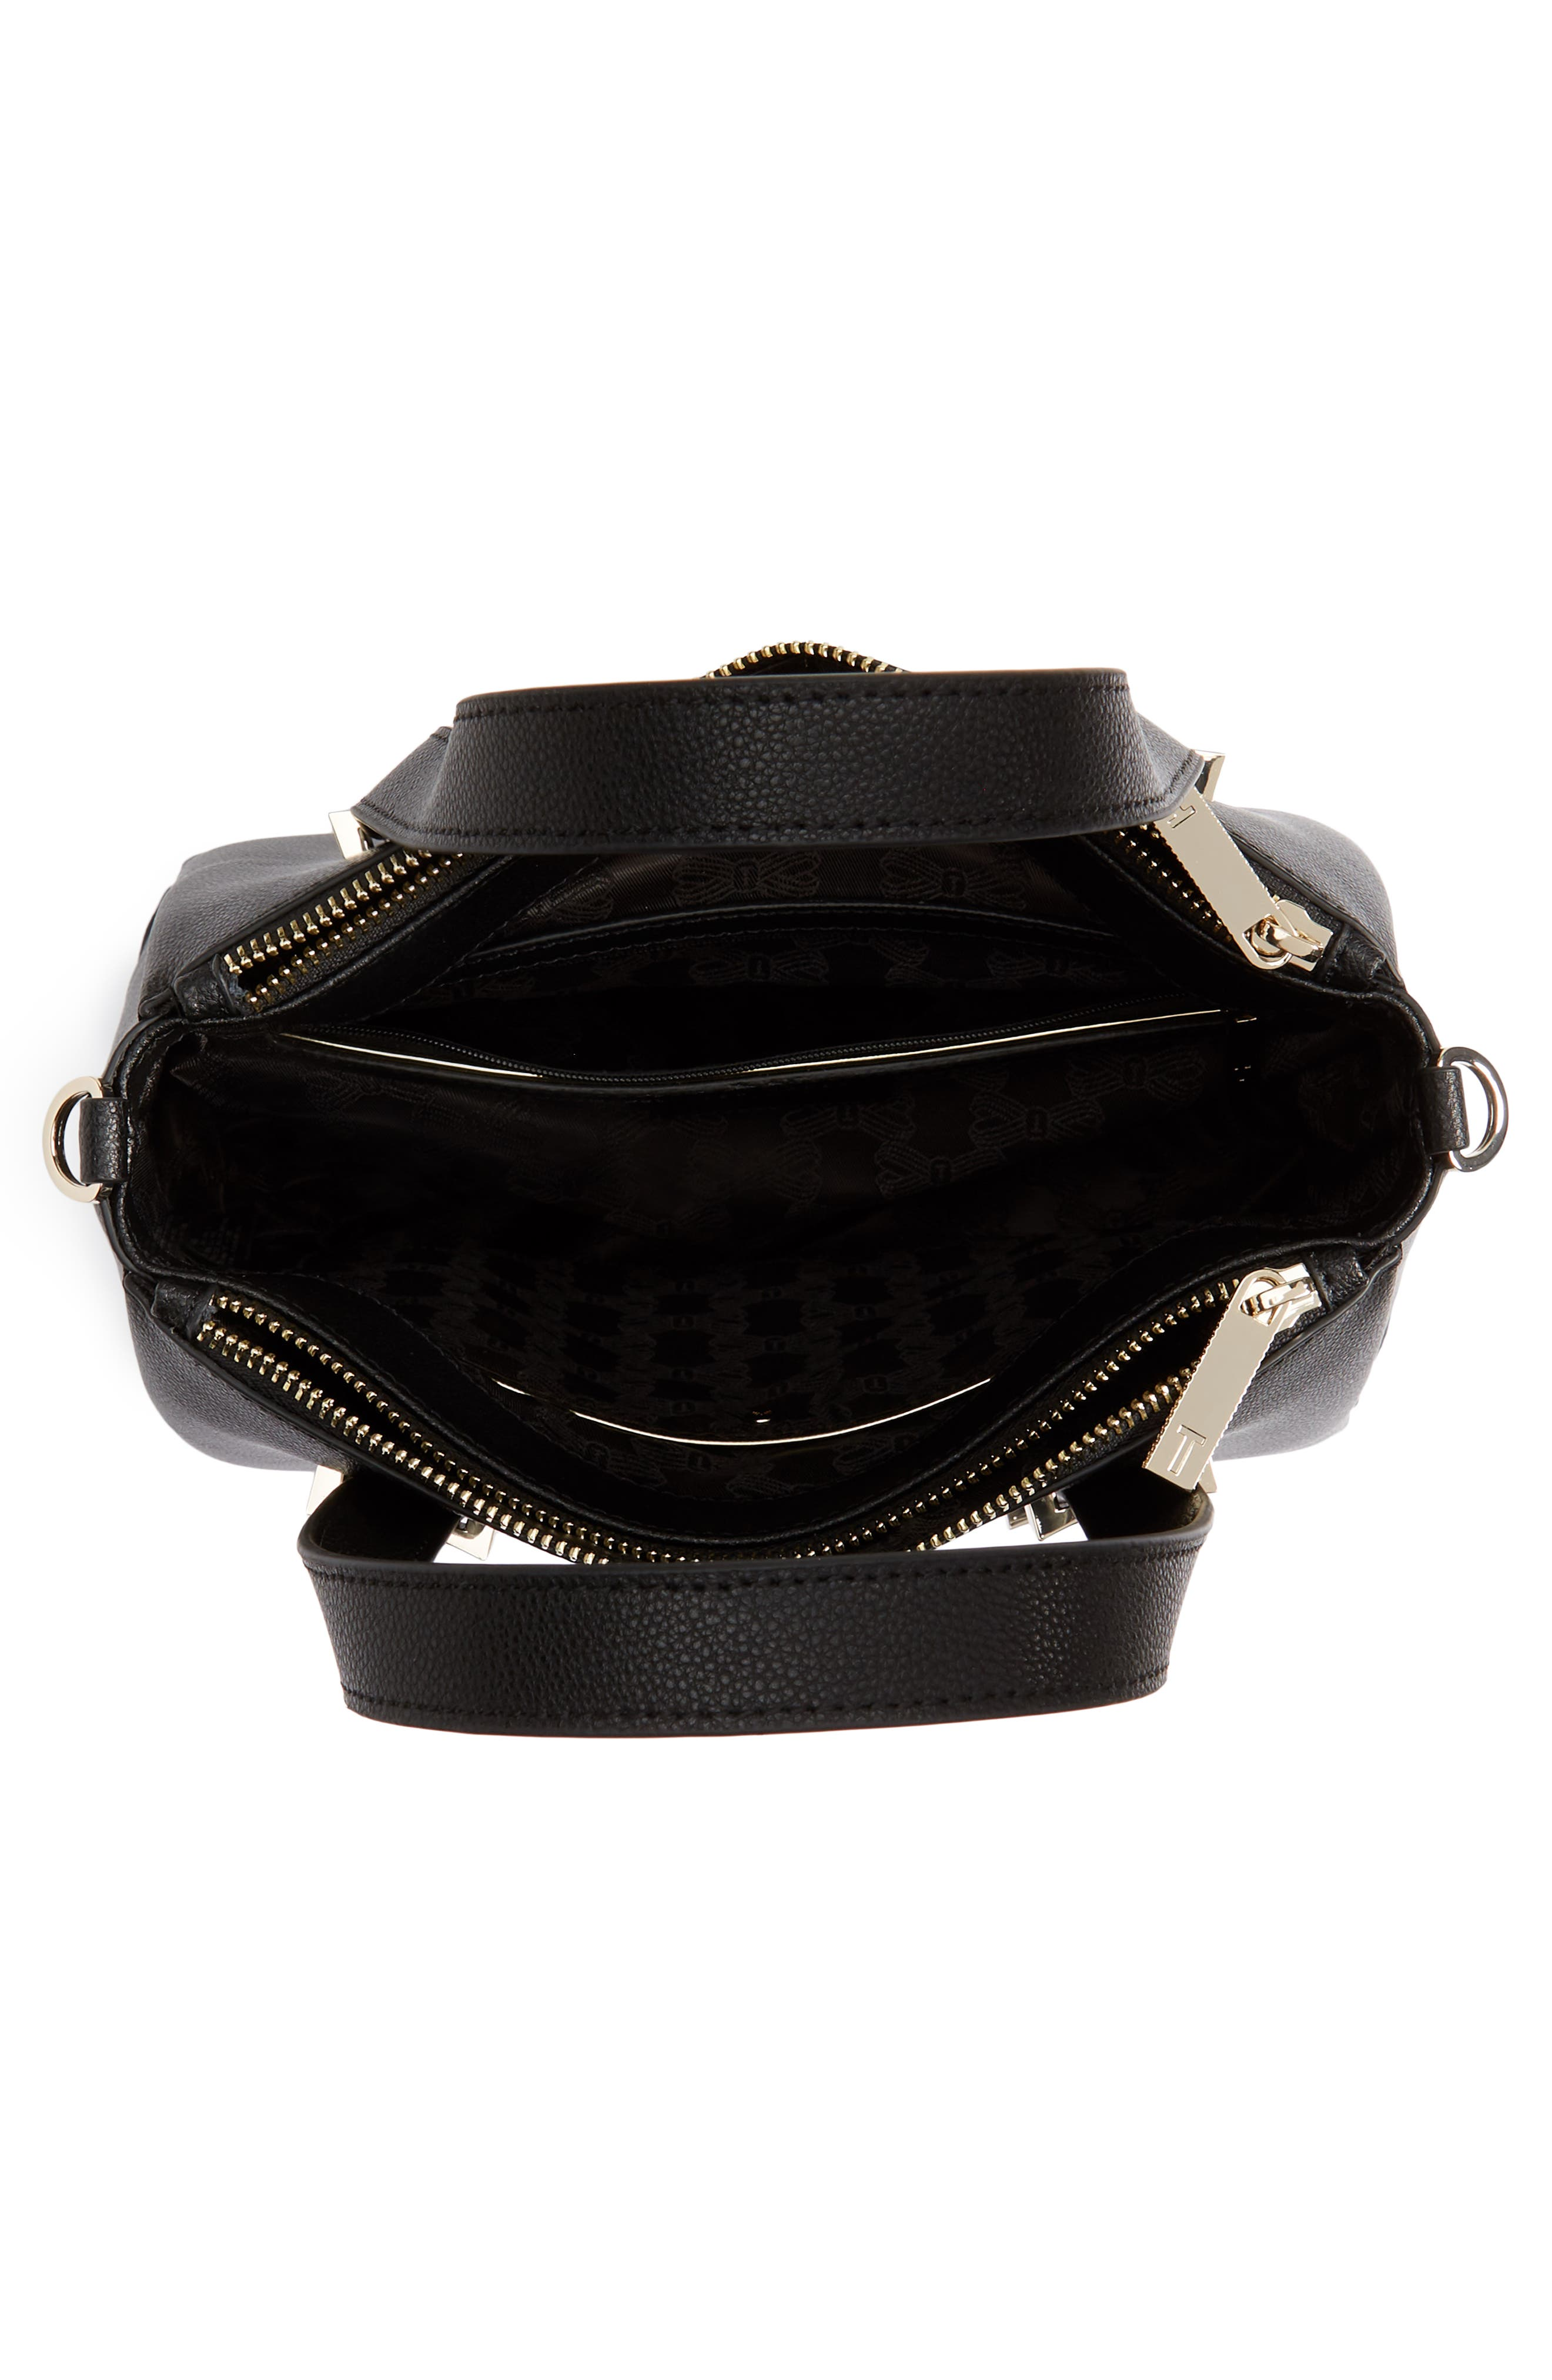 Julieet Large Adjustable Handle Leather Satchel,                             Alternate thumbnail 4, color,                             BLACK